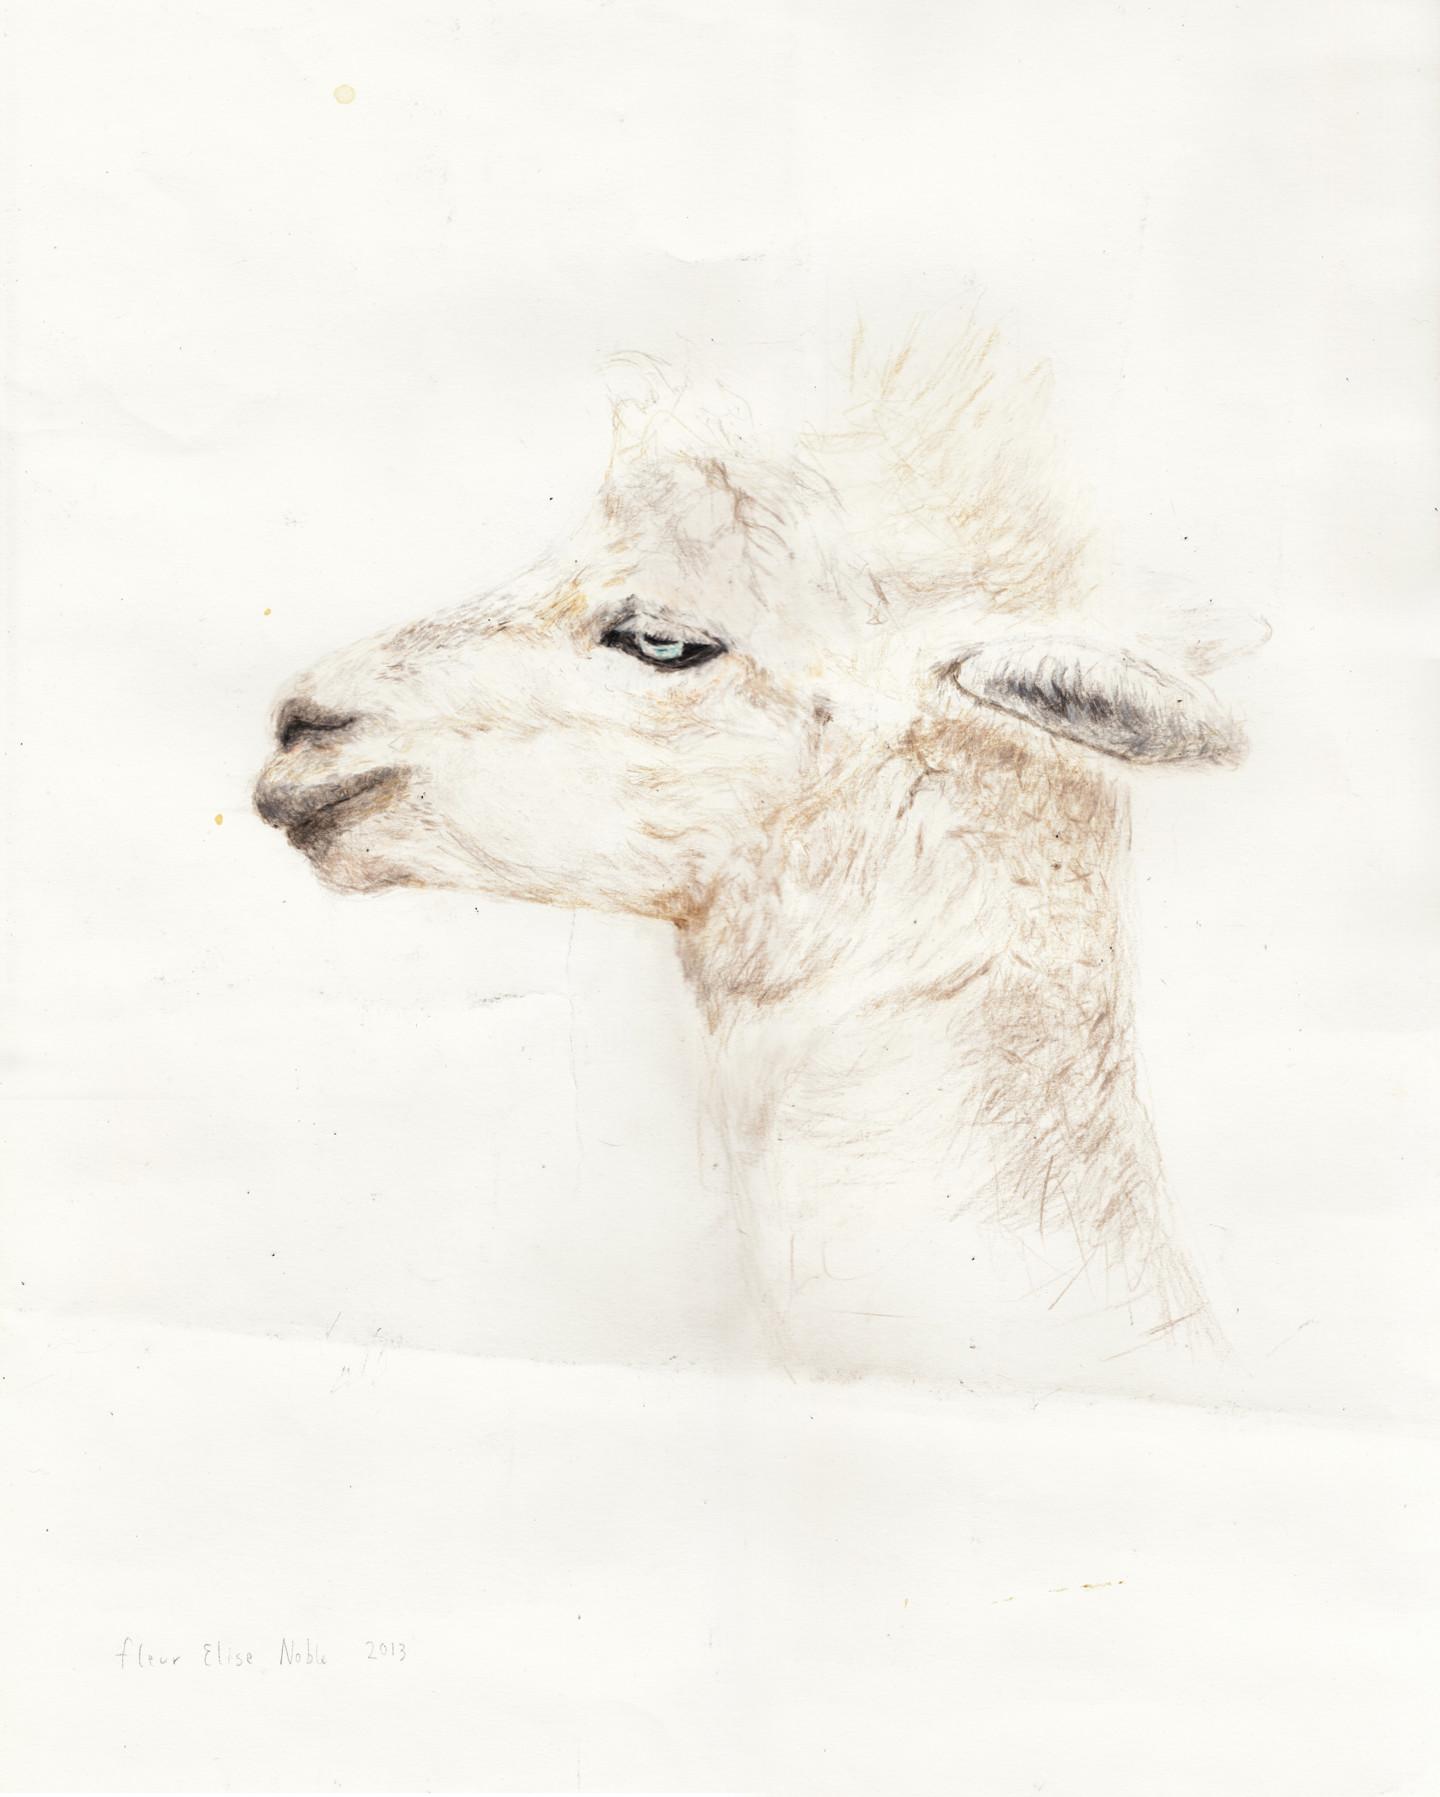 Fleur Elise Noble - Alpaca Profile